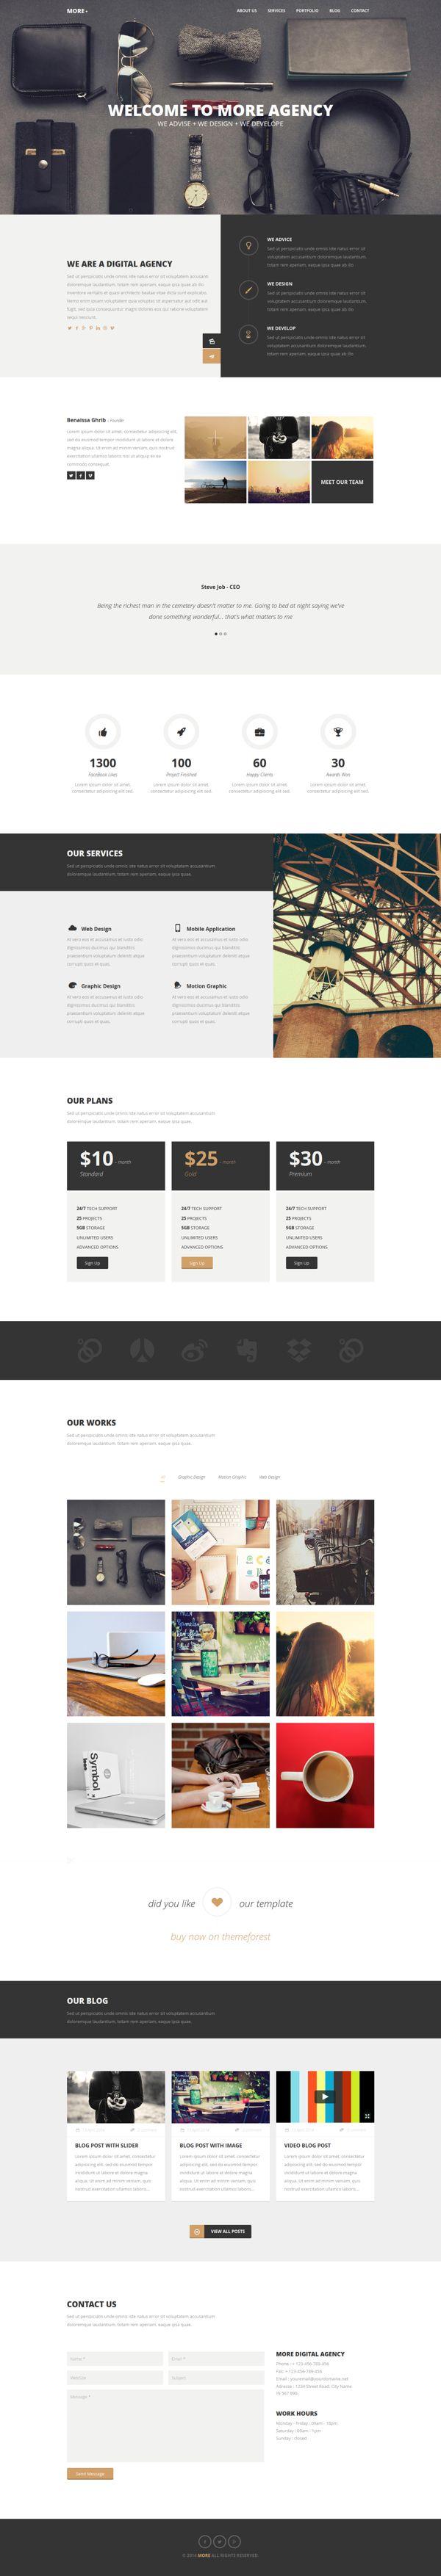 MORE - Creative One Page WordPress Theme on Behance